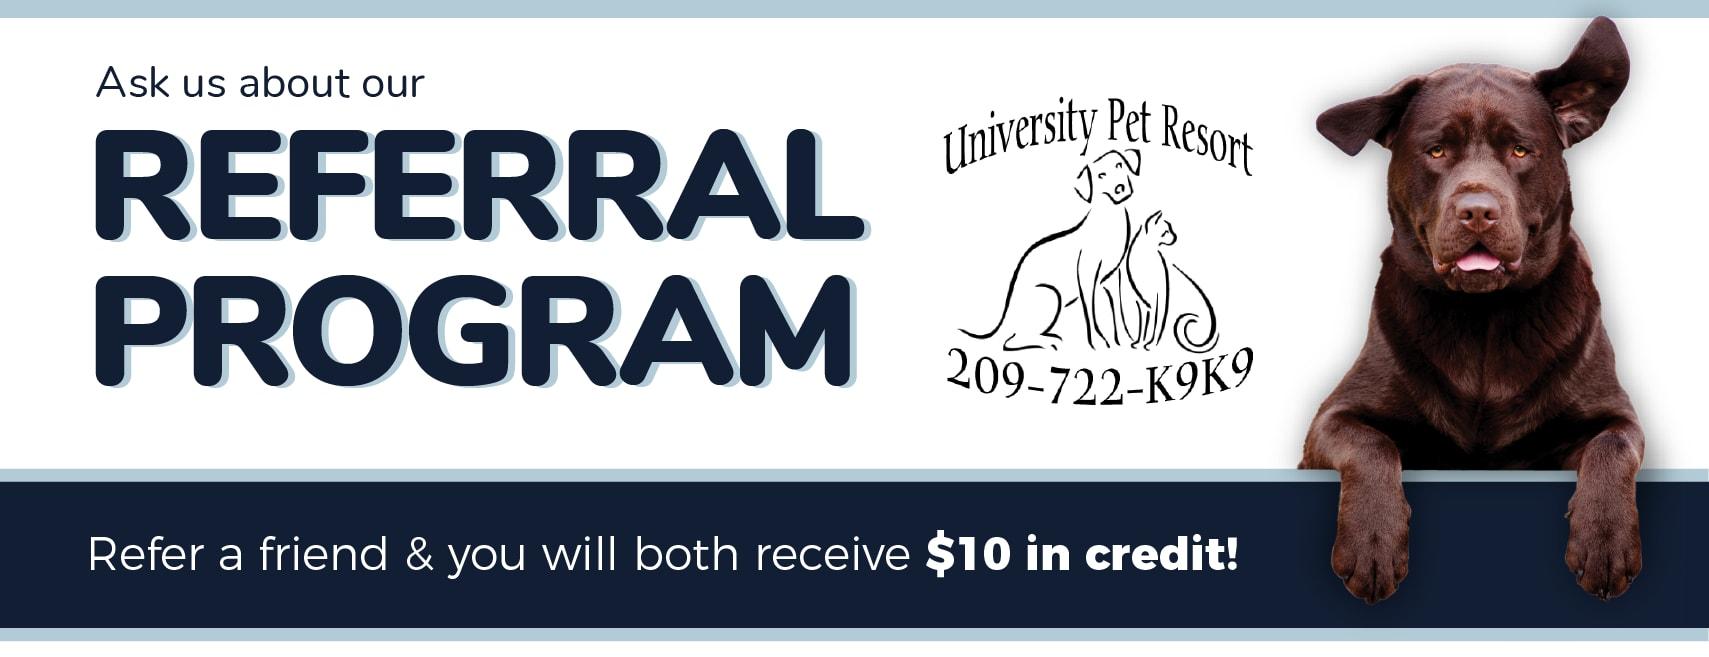 Referal program at University Pet Resort in Merced, California